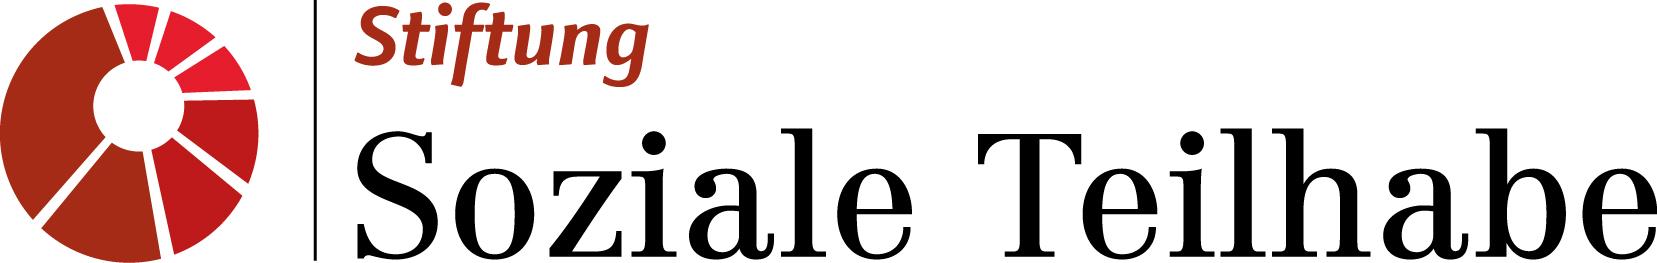 Logo_Stiftung_Soziale_Teilhabe